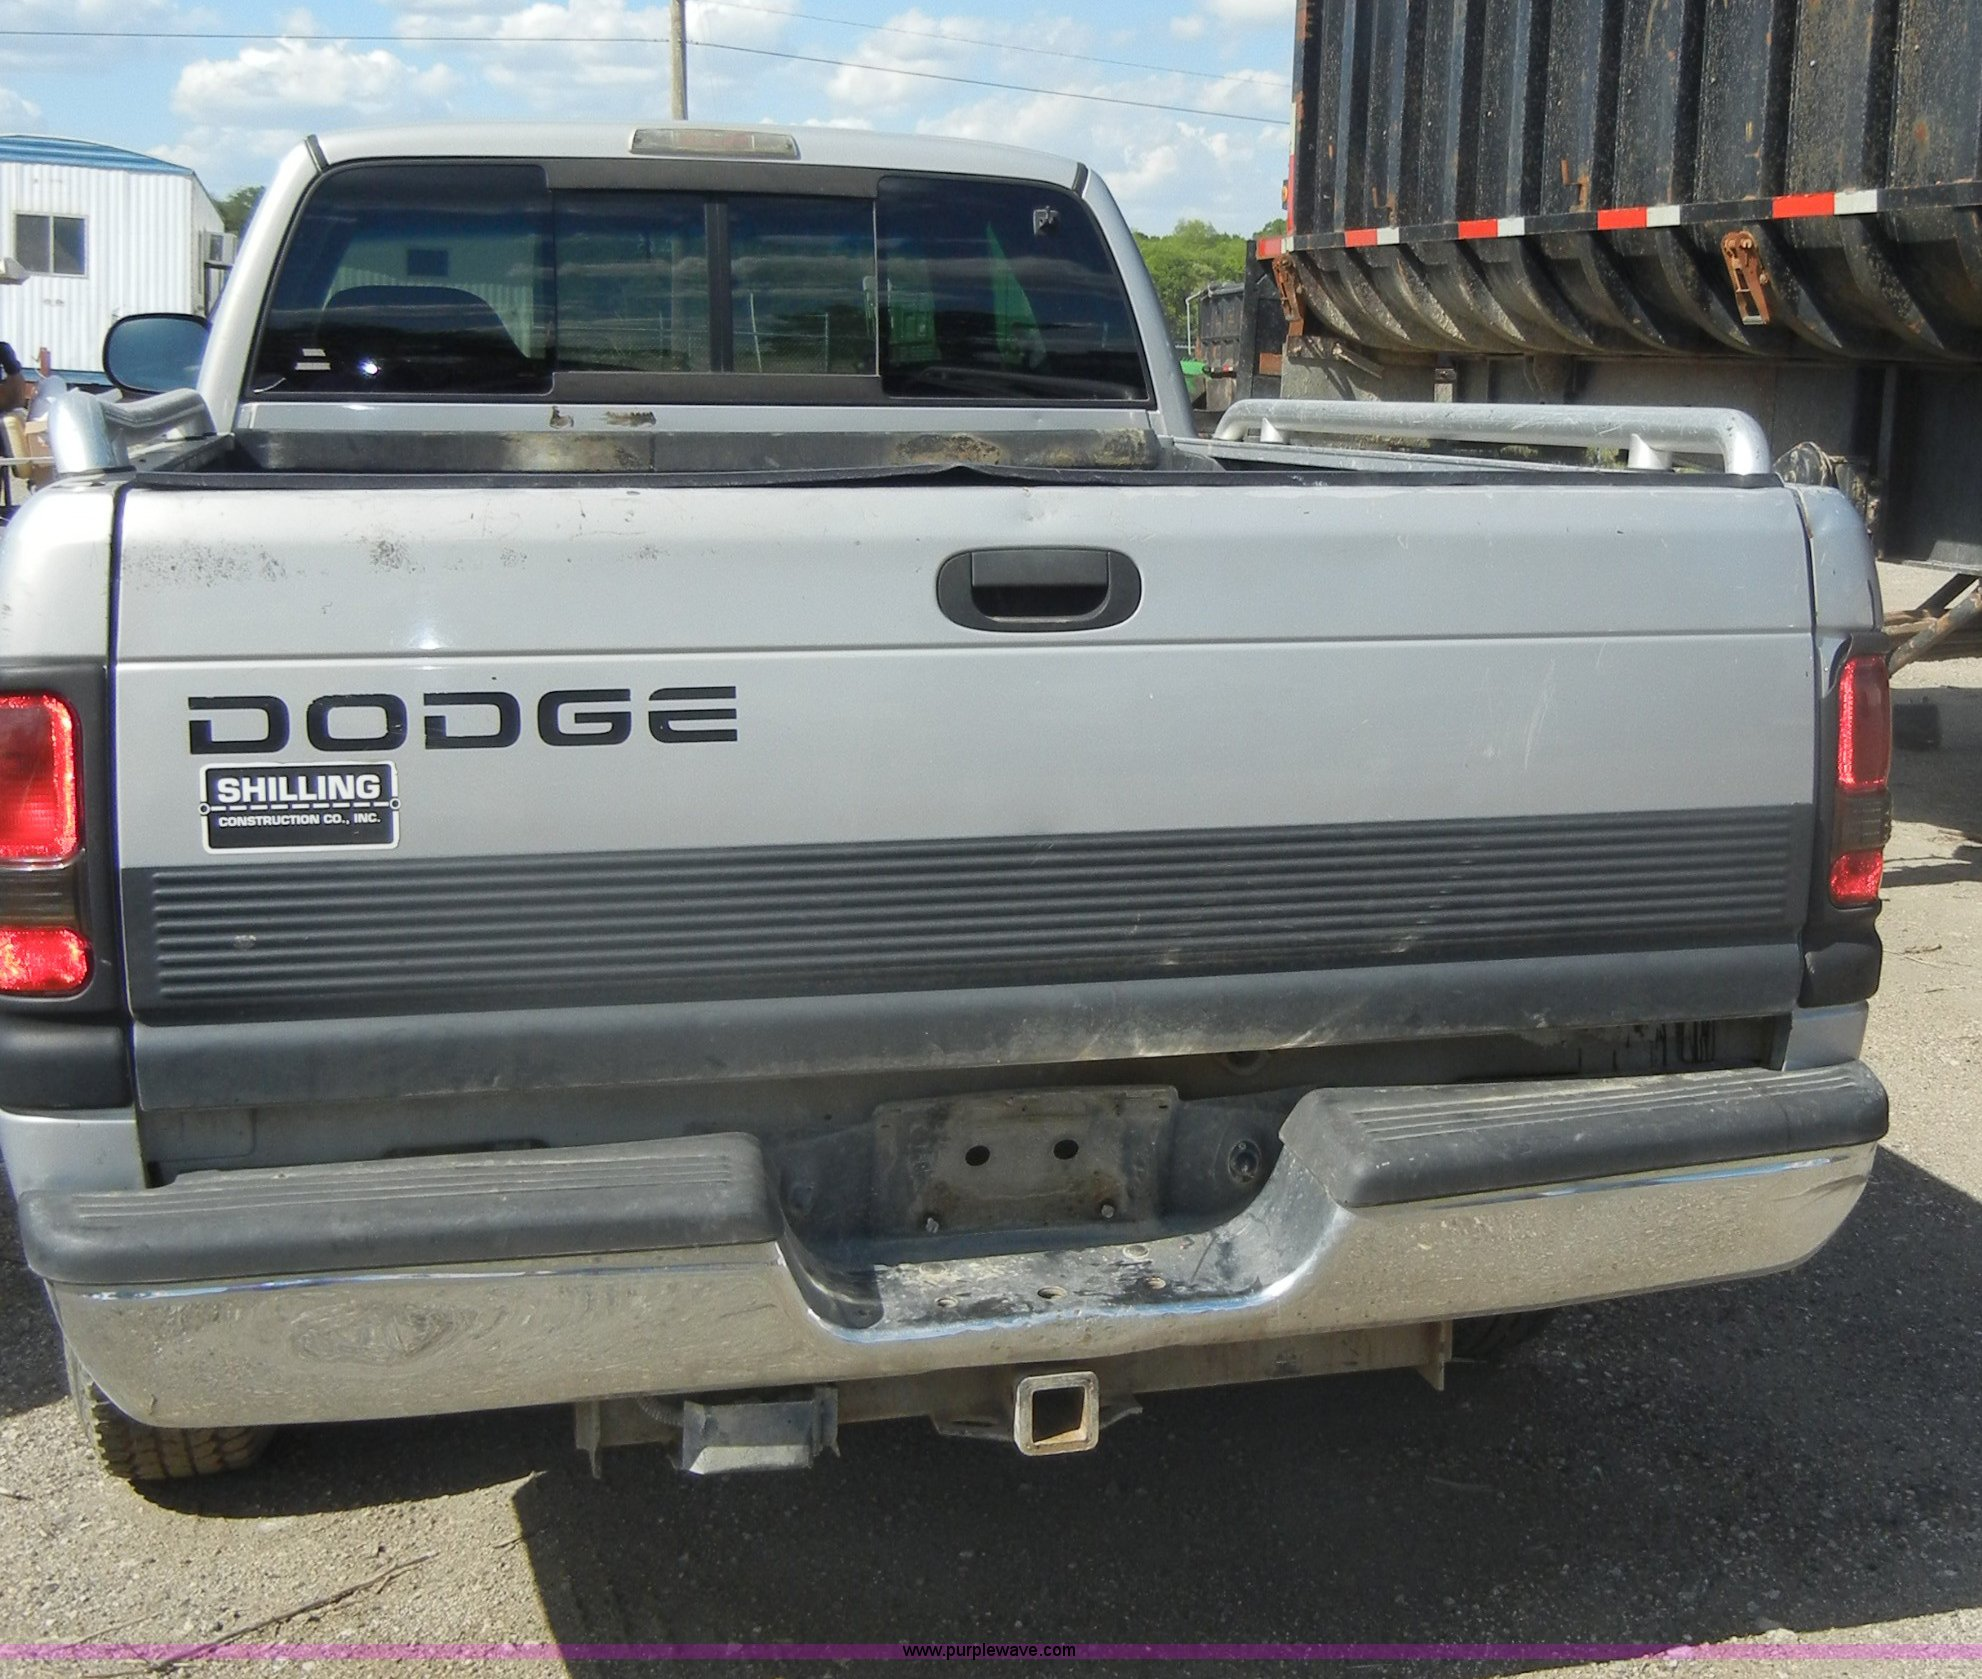 1999 Dodge Ram 2500 Laramie SLT Quad Cab Pickup Truck